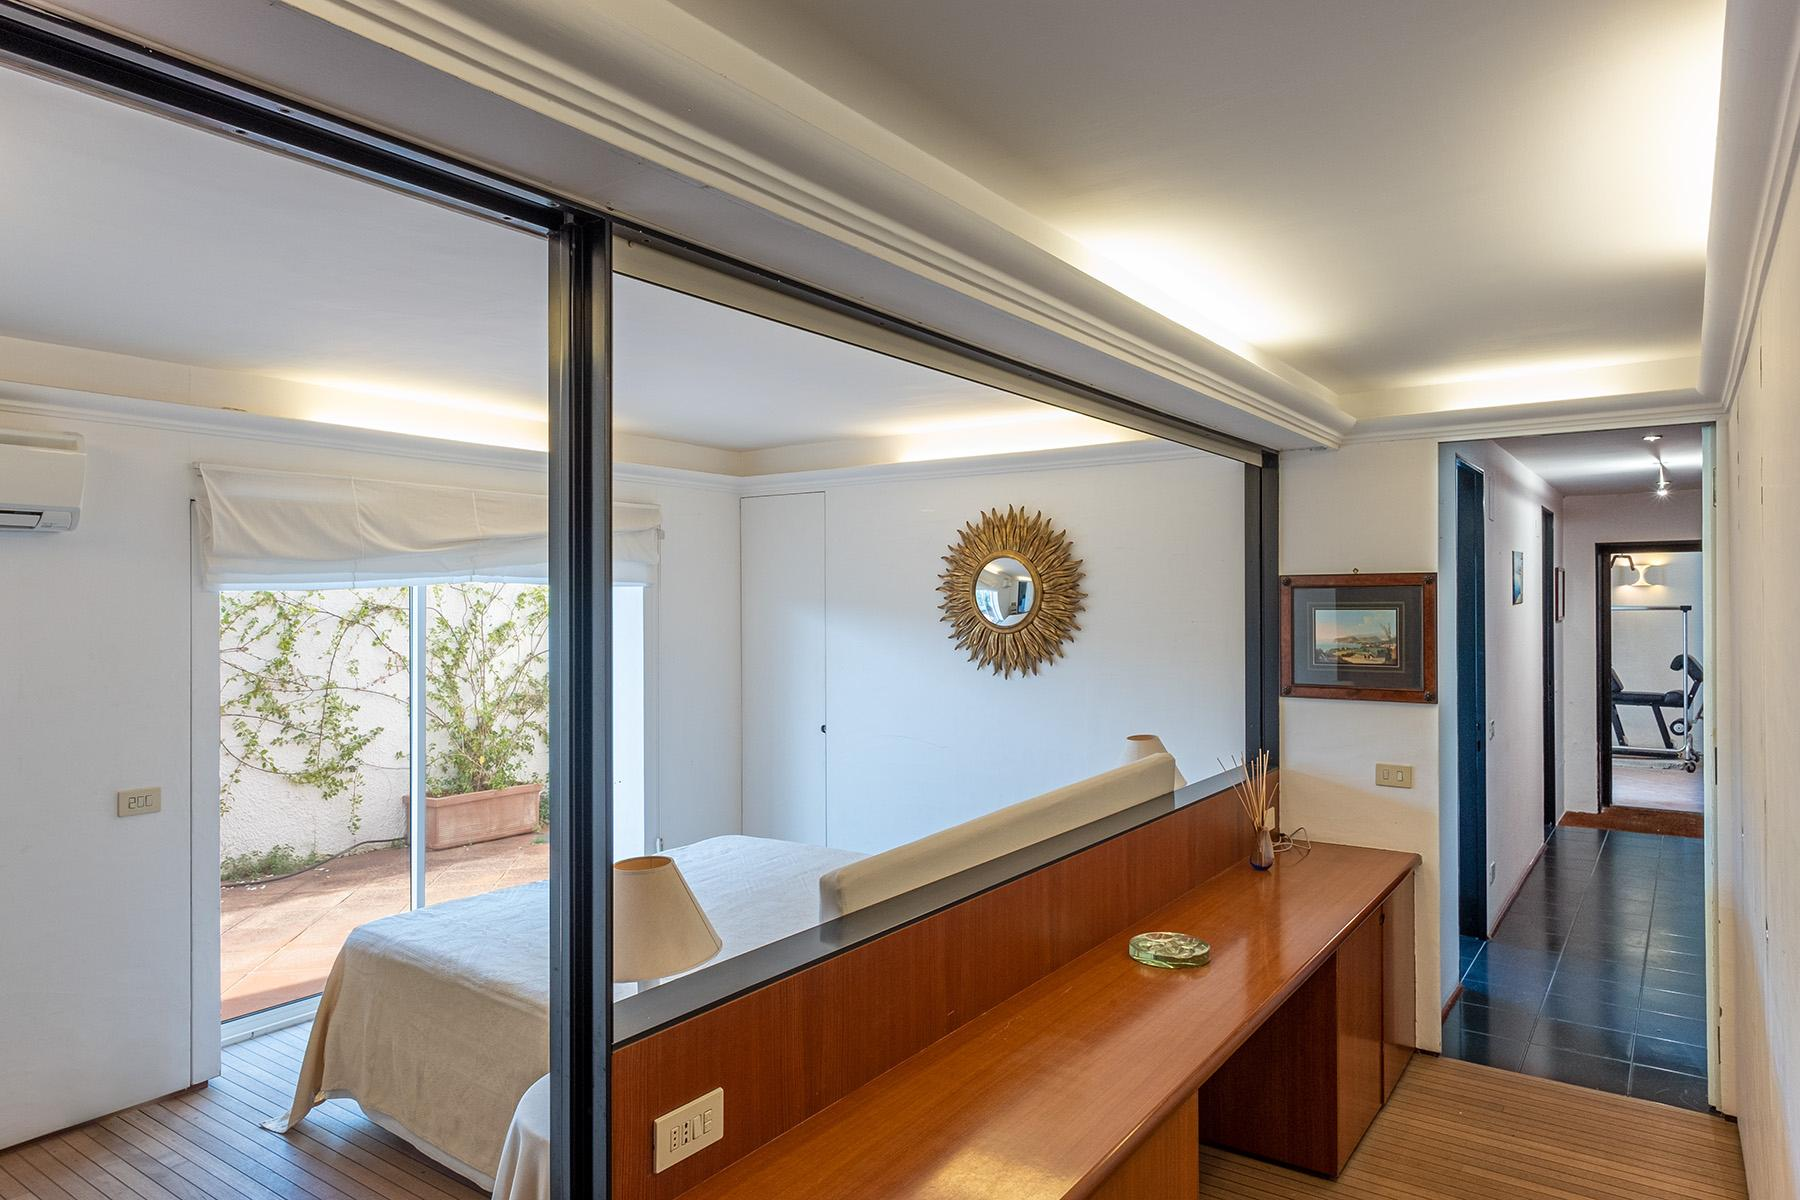 Panoramic villa with swimming pool in Anacapri city center - 12